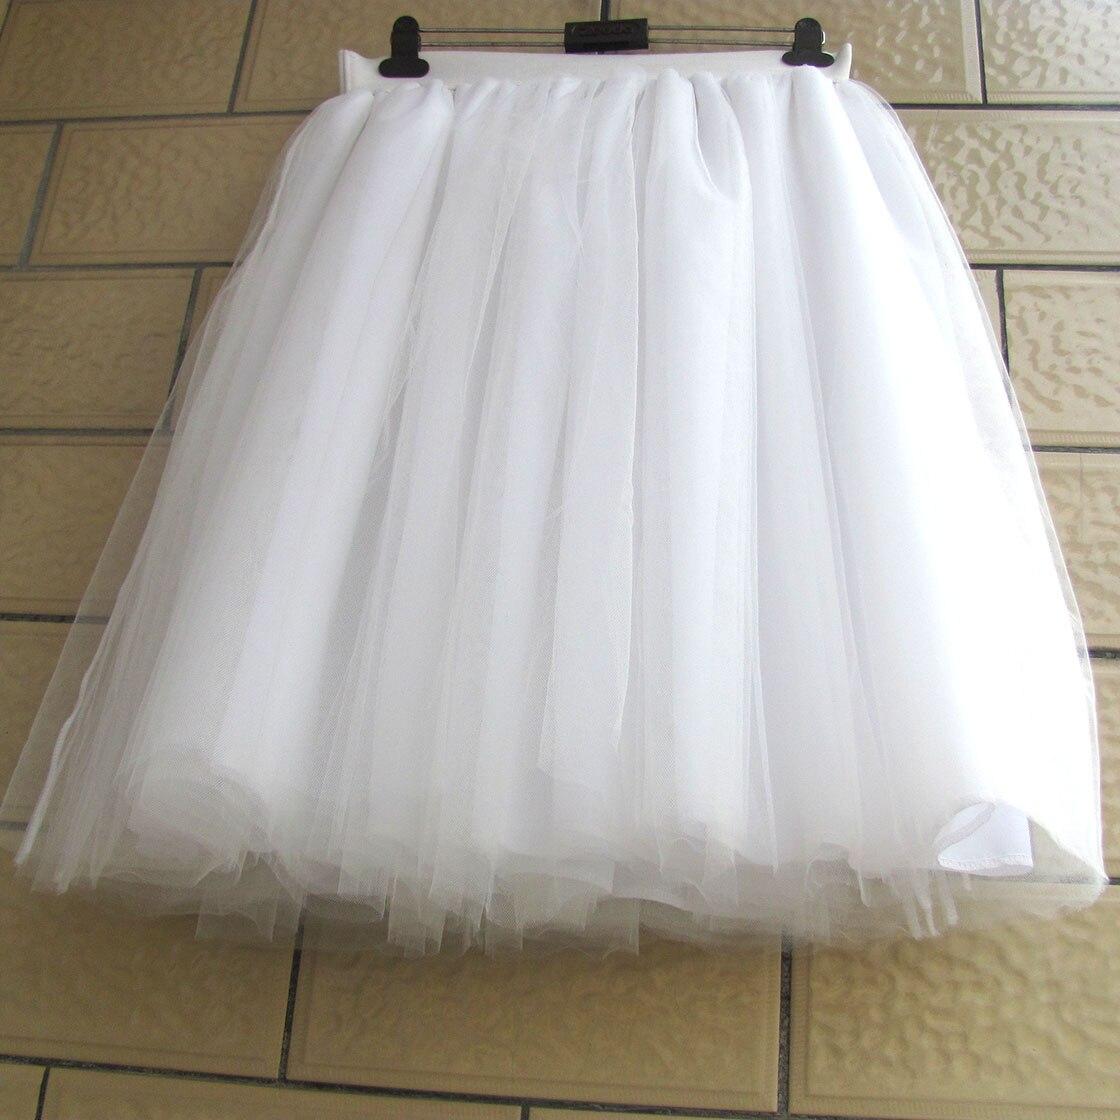 White Tulle Skirt Women Lace chiffon Ball Gown Knee Length Empire Girls Tutu Plus Size Tulle Skirts 5XL XXXXL Custom 6 Layer